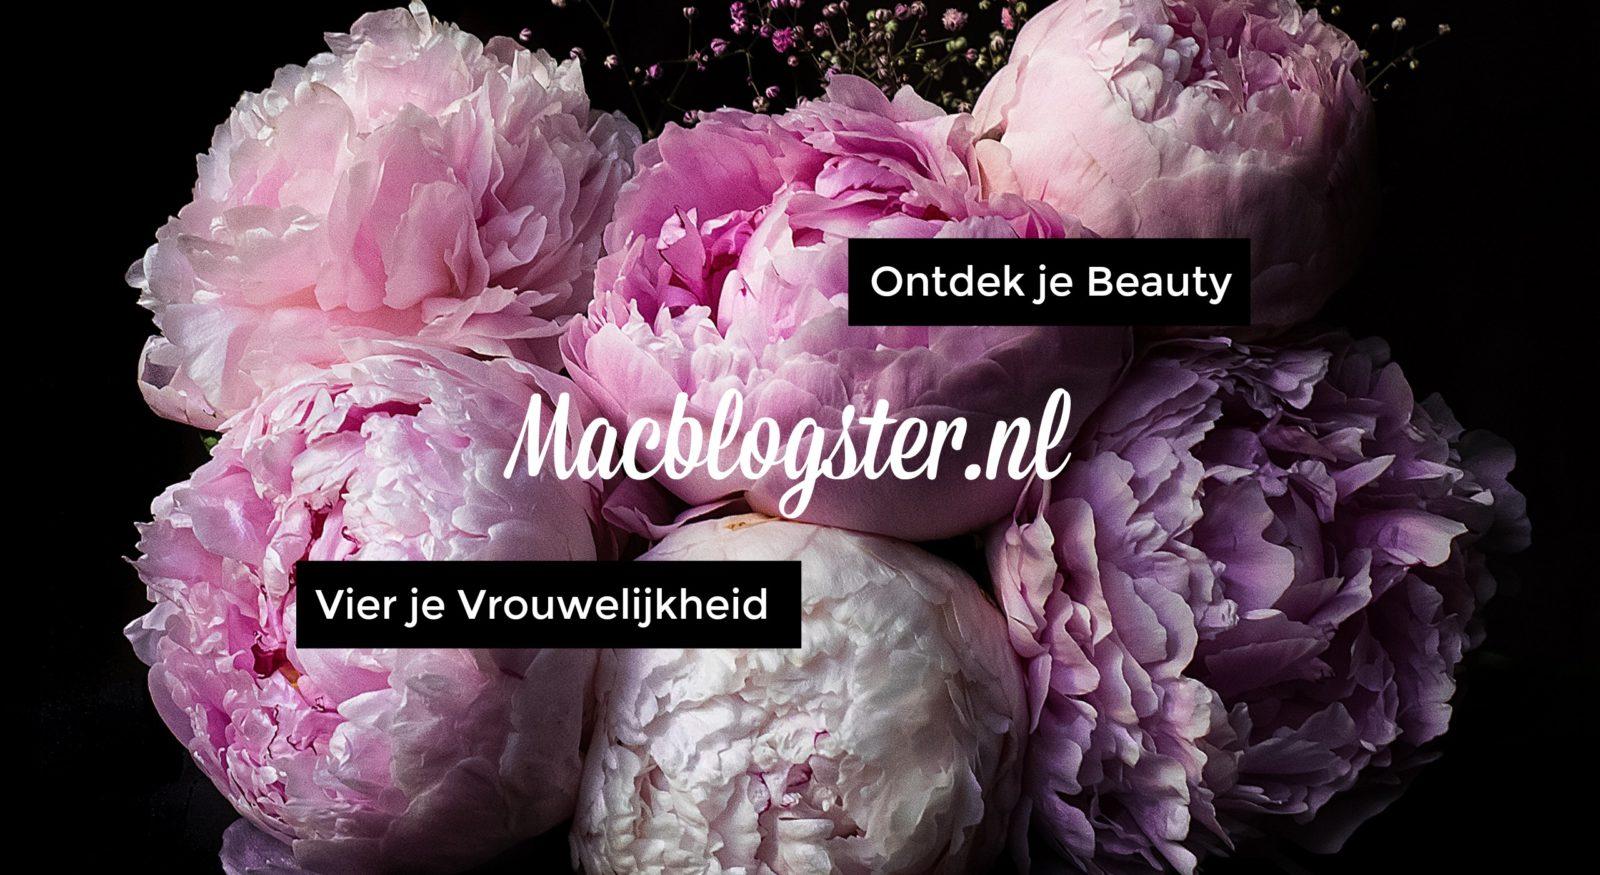 Macblogster_beauty_blog_vrouwen